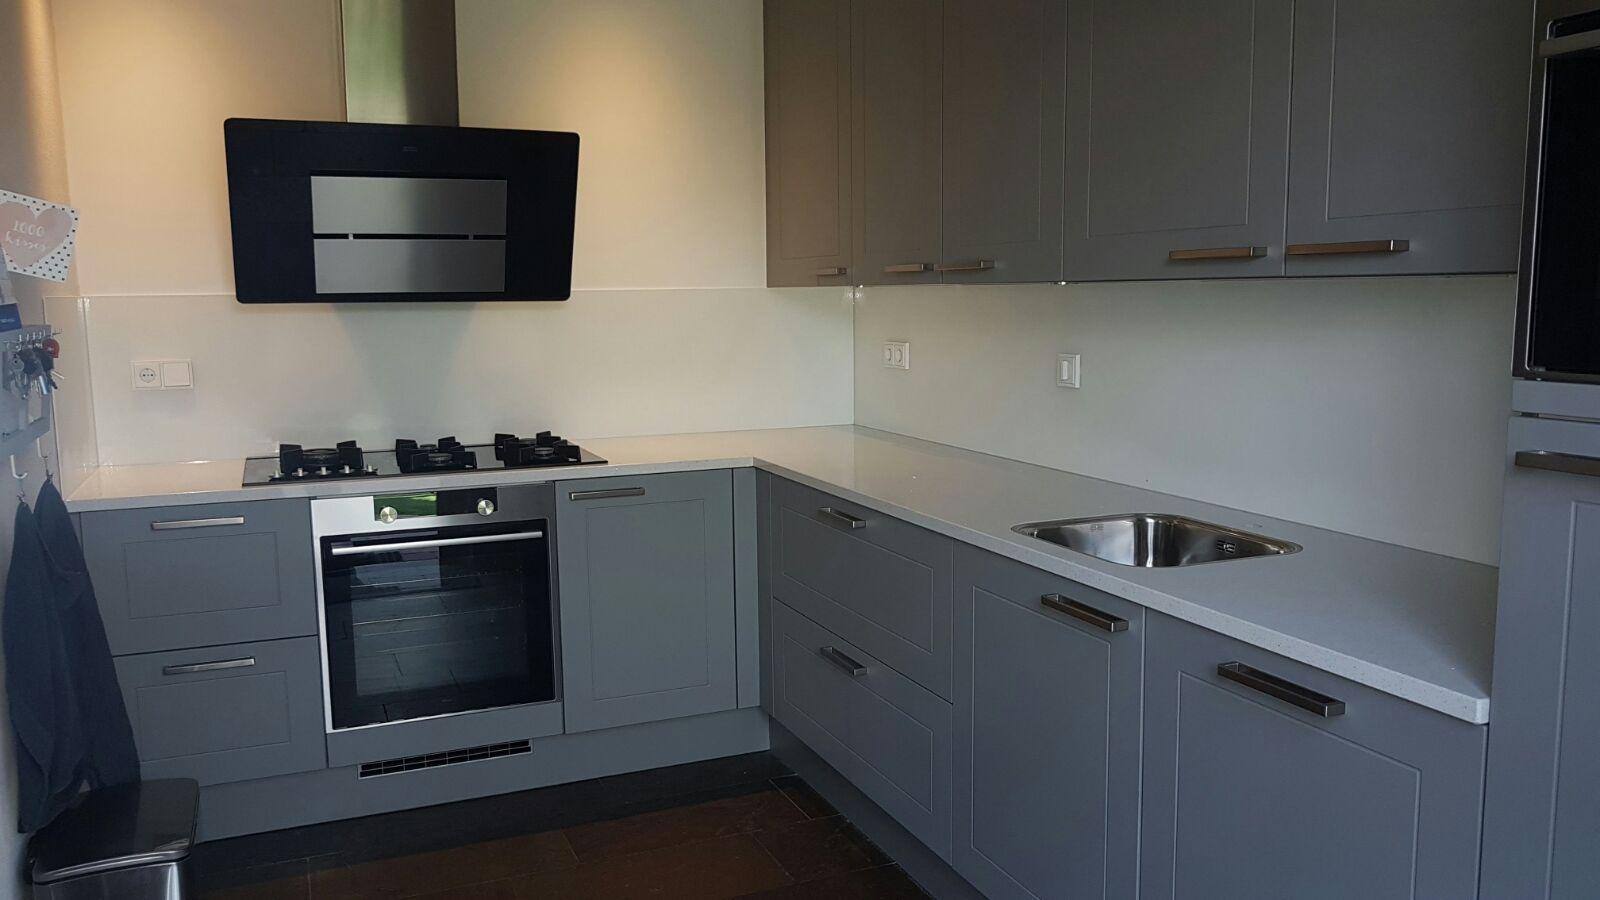 Keukenkast glazen ontwerp - Kleur verf moderne keuken ...